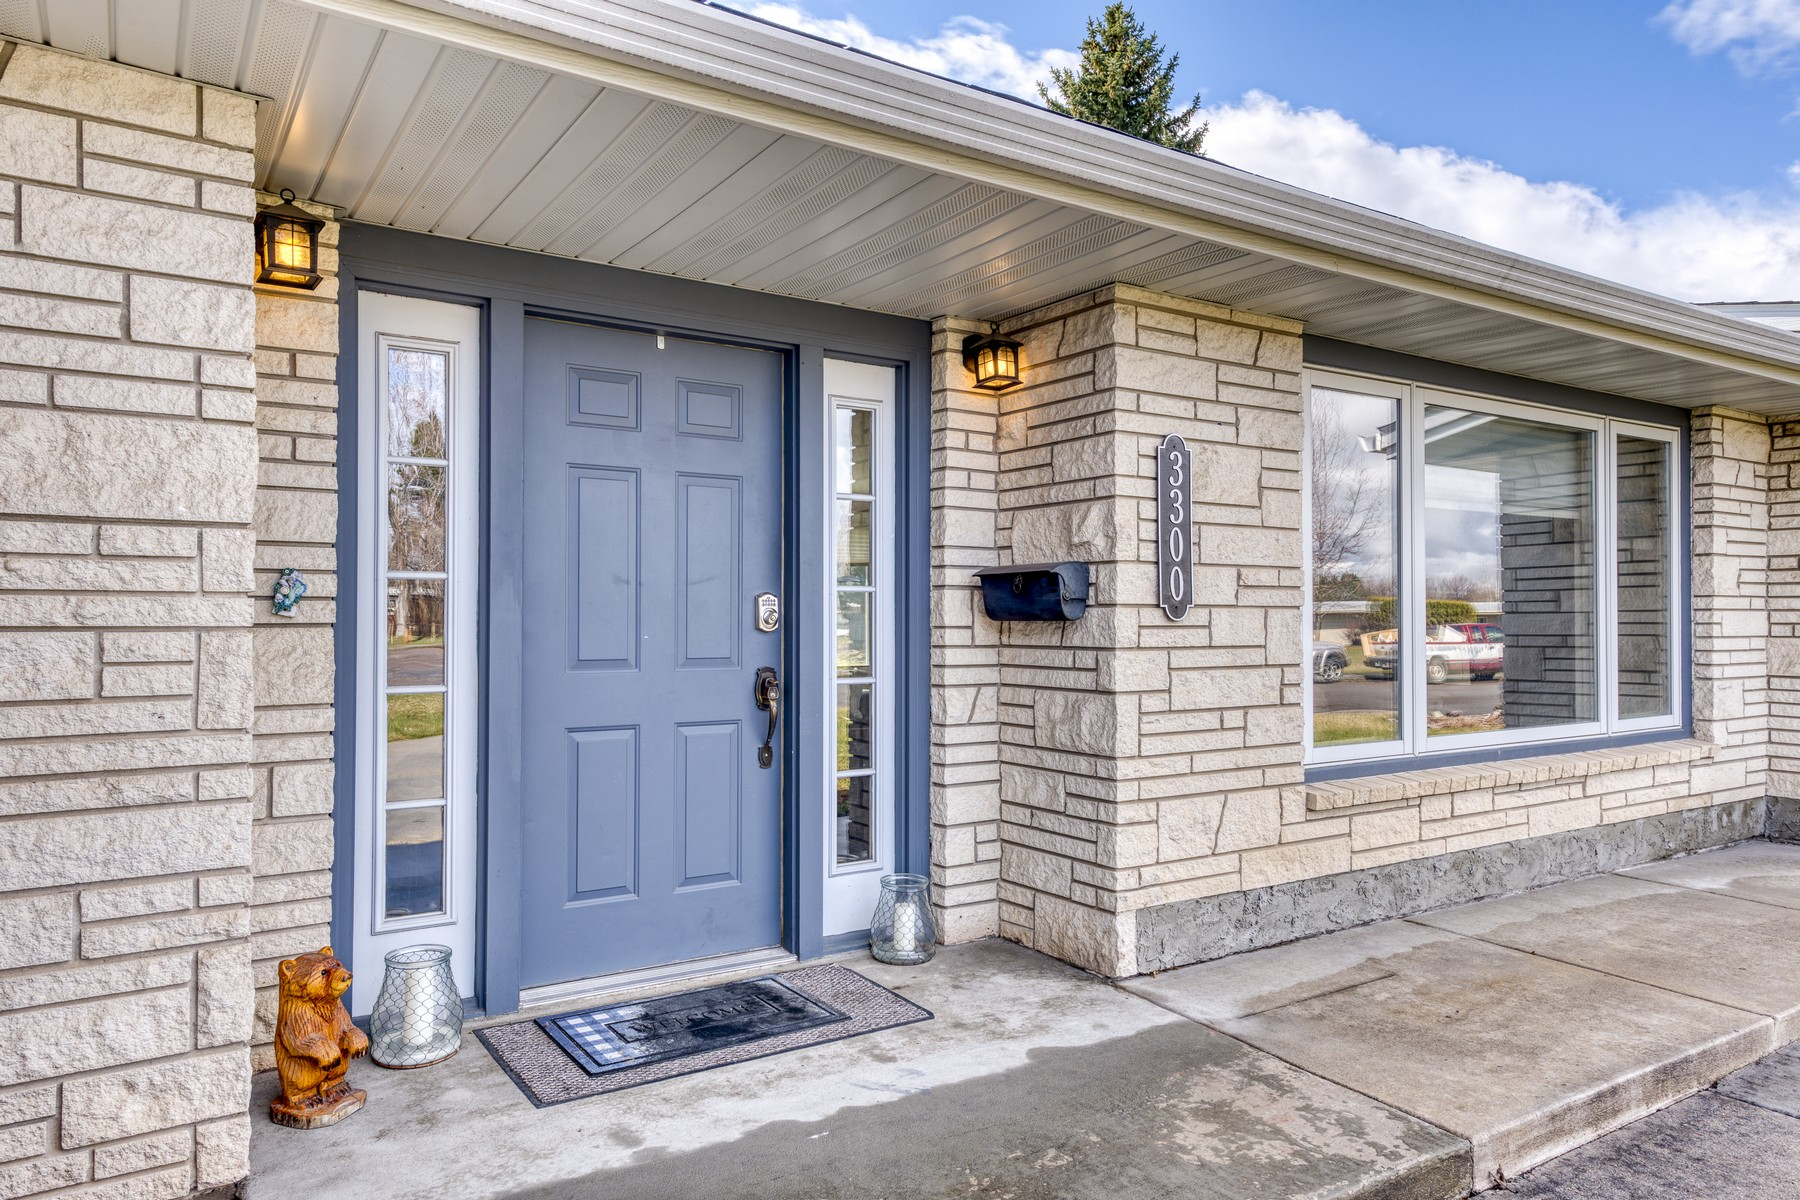 Single Family Homes for Sale at 3300 Hollis Street Missoula, Montana 59801 United States